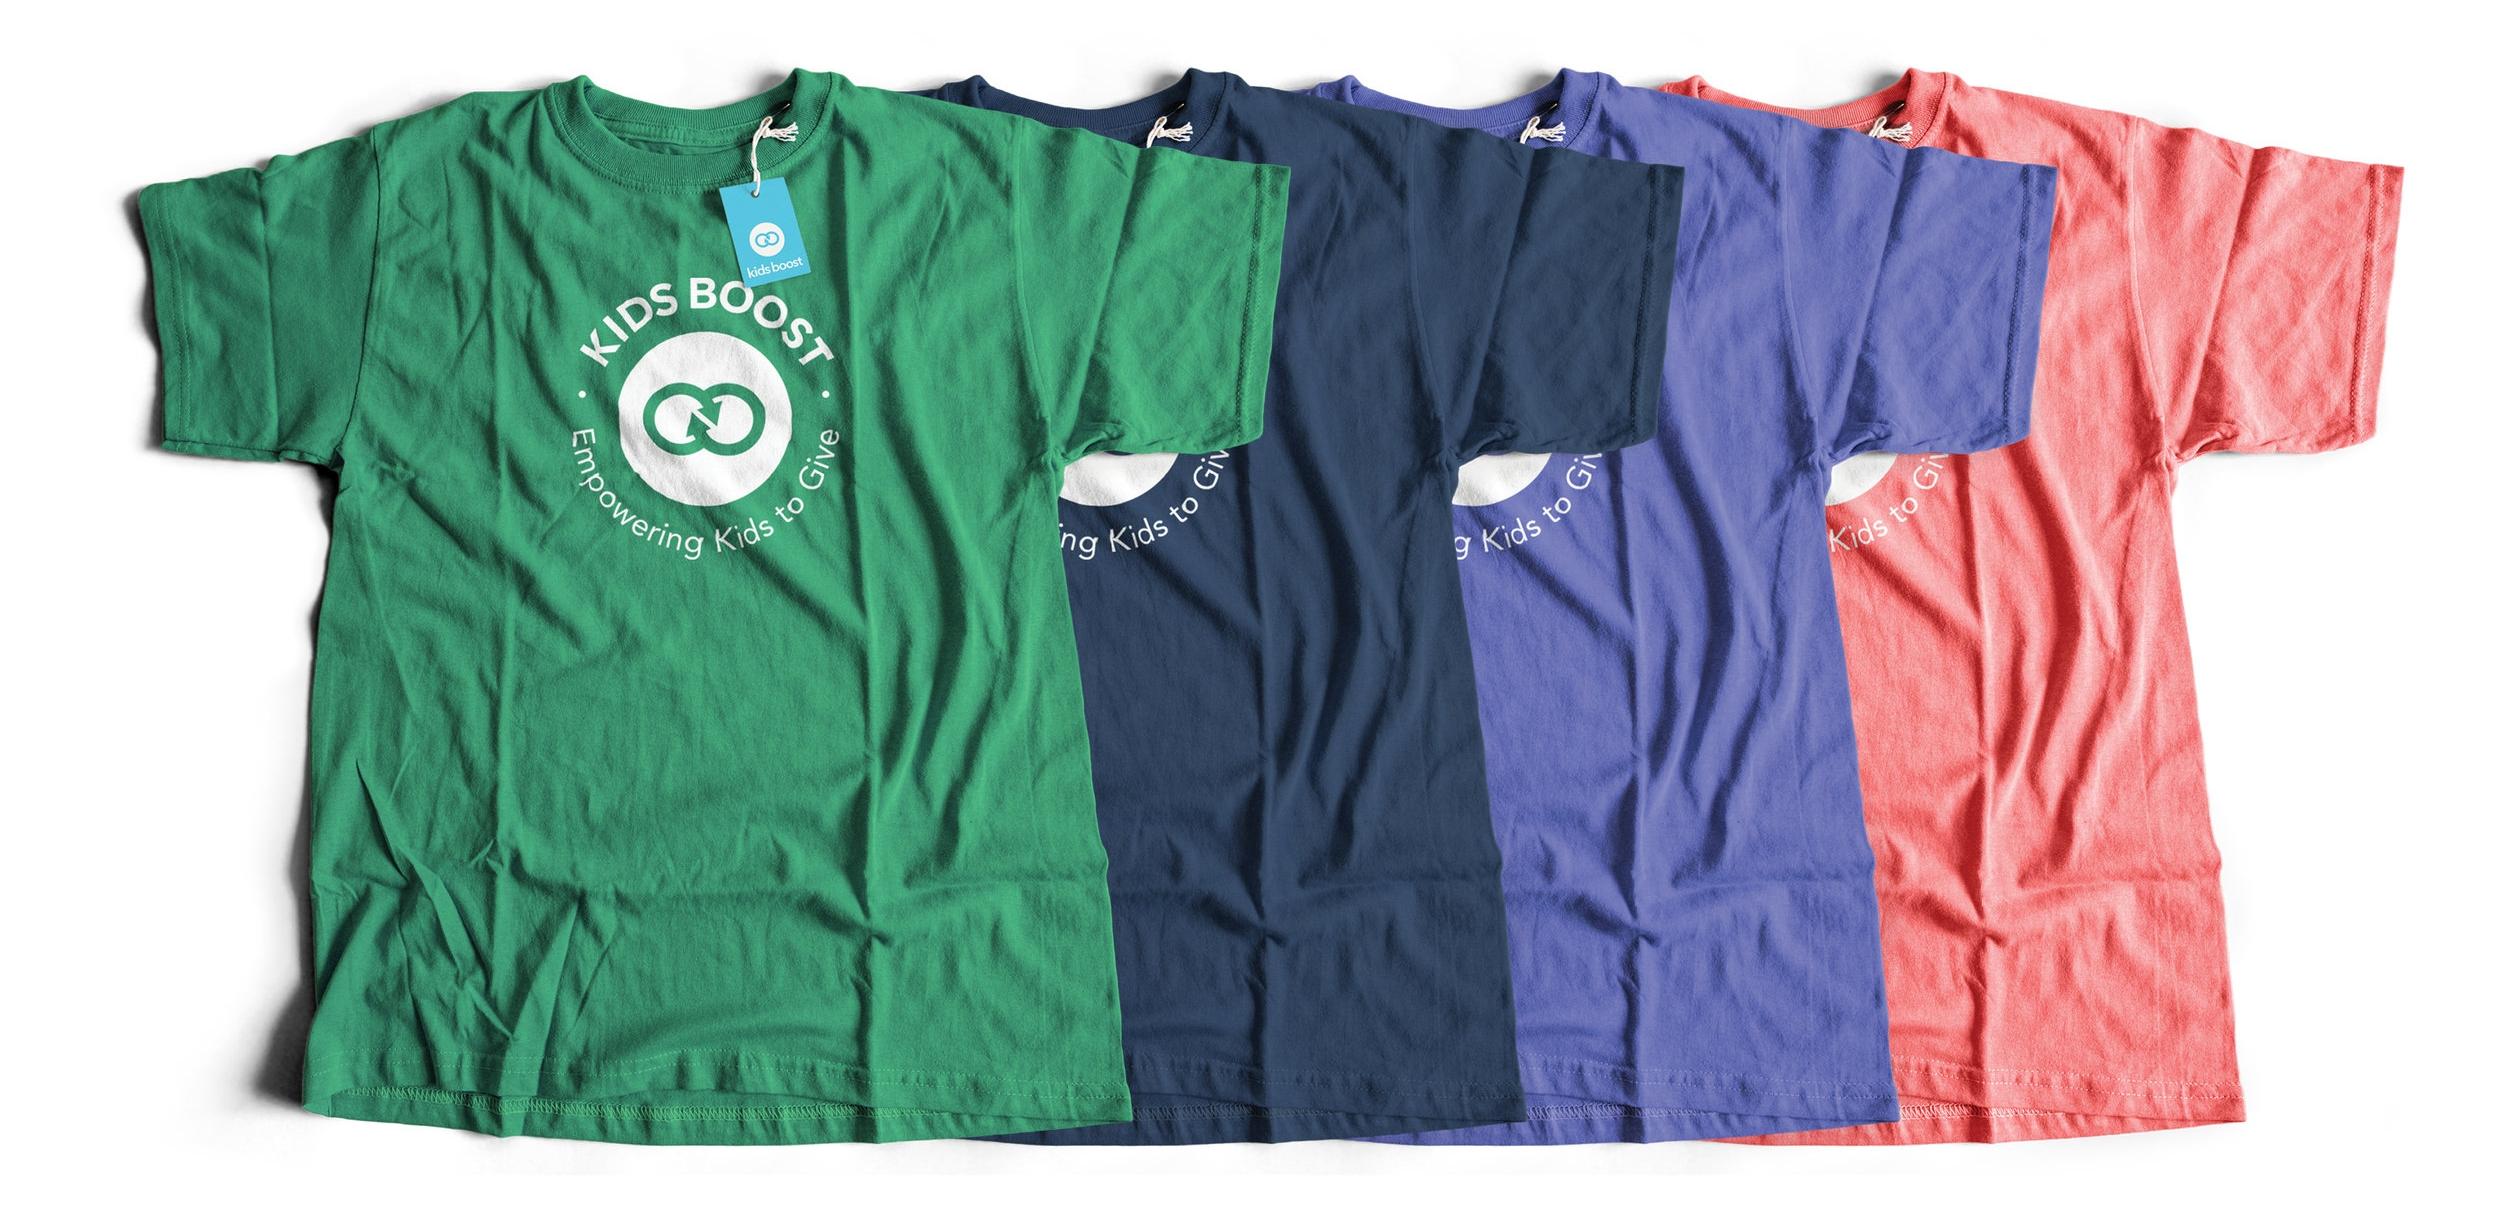 KidsB_shirts.jpg